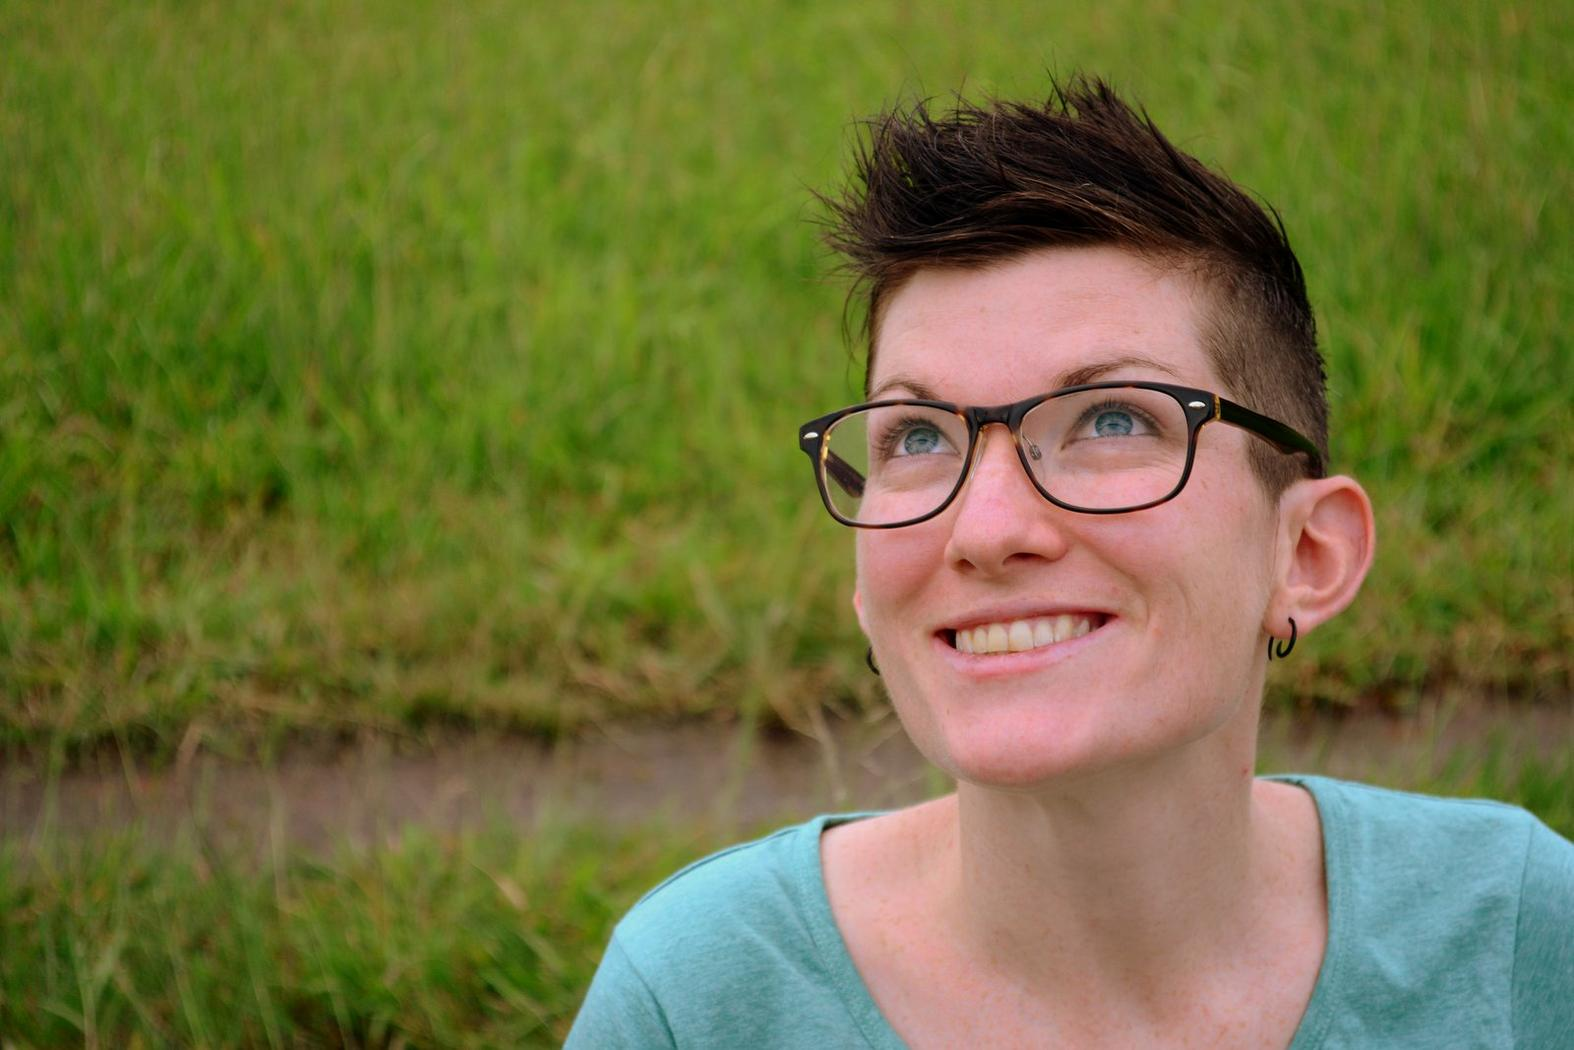 Jenn O'Connell